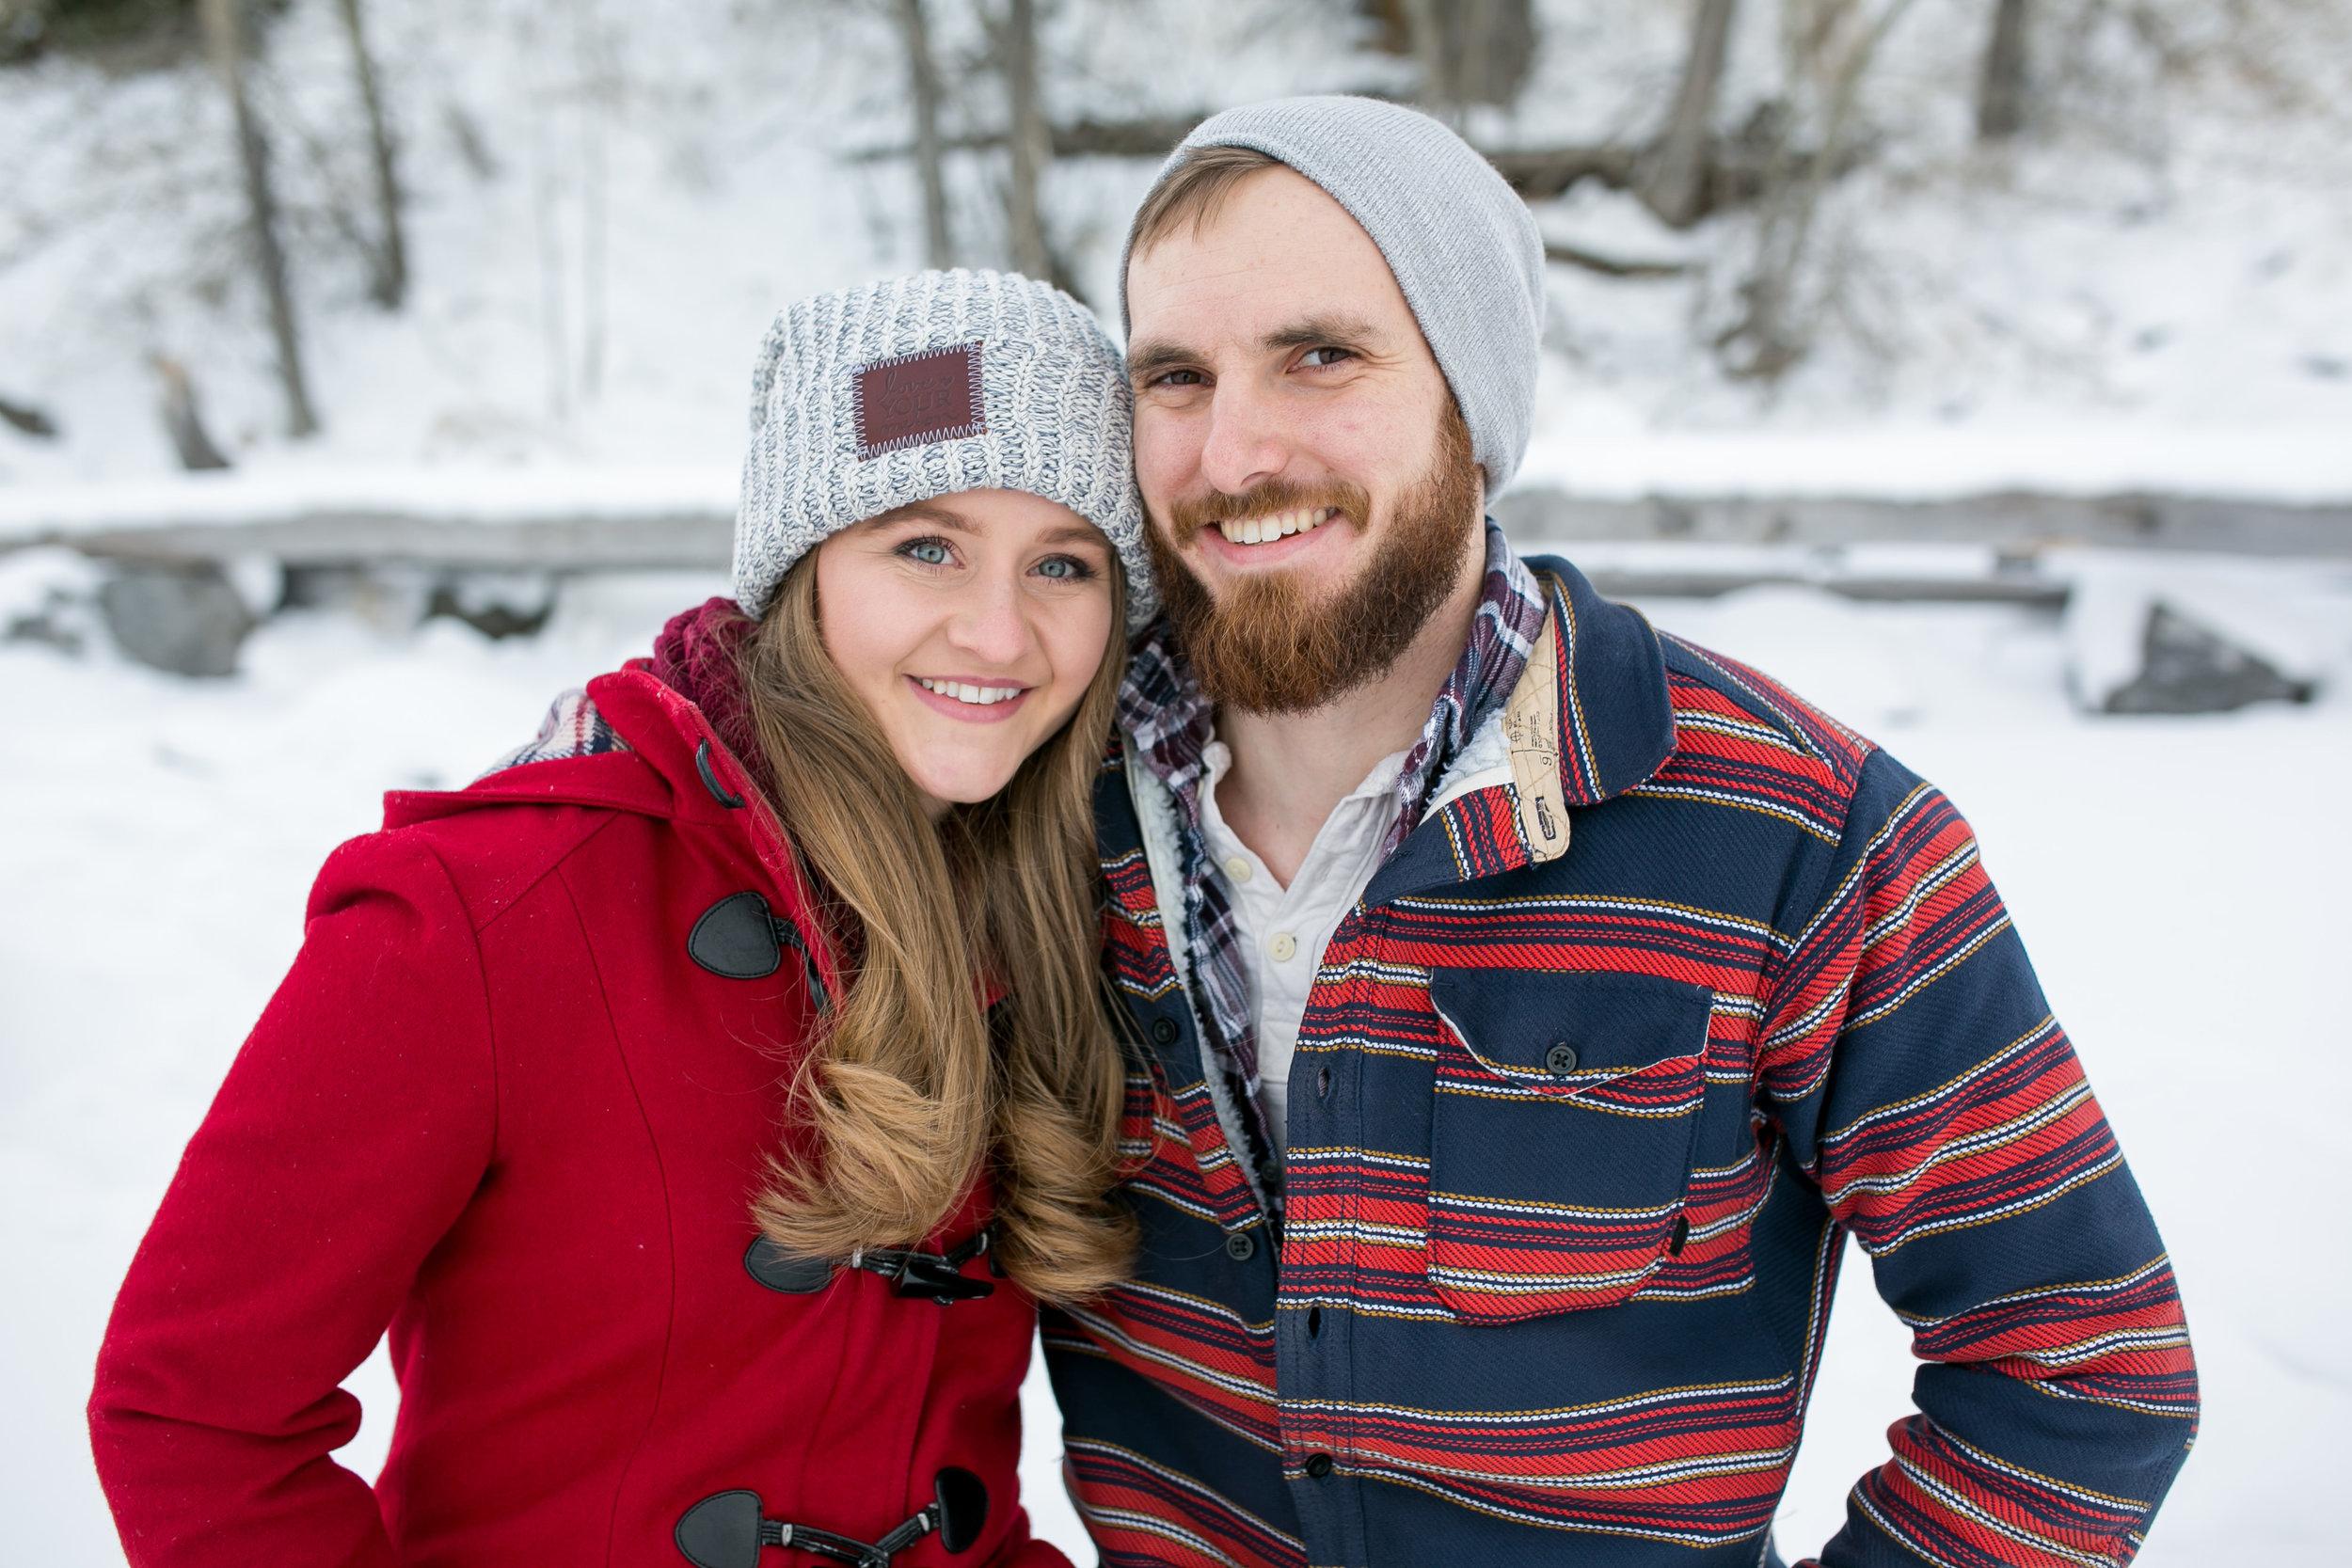 Engagement Photos at Lake MInniwanka in Banff, AB.